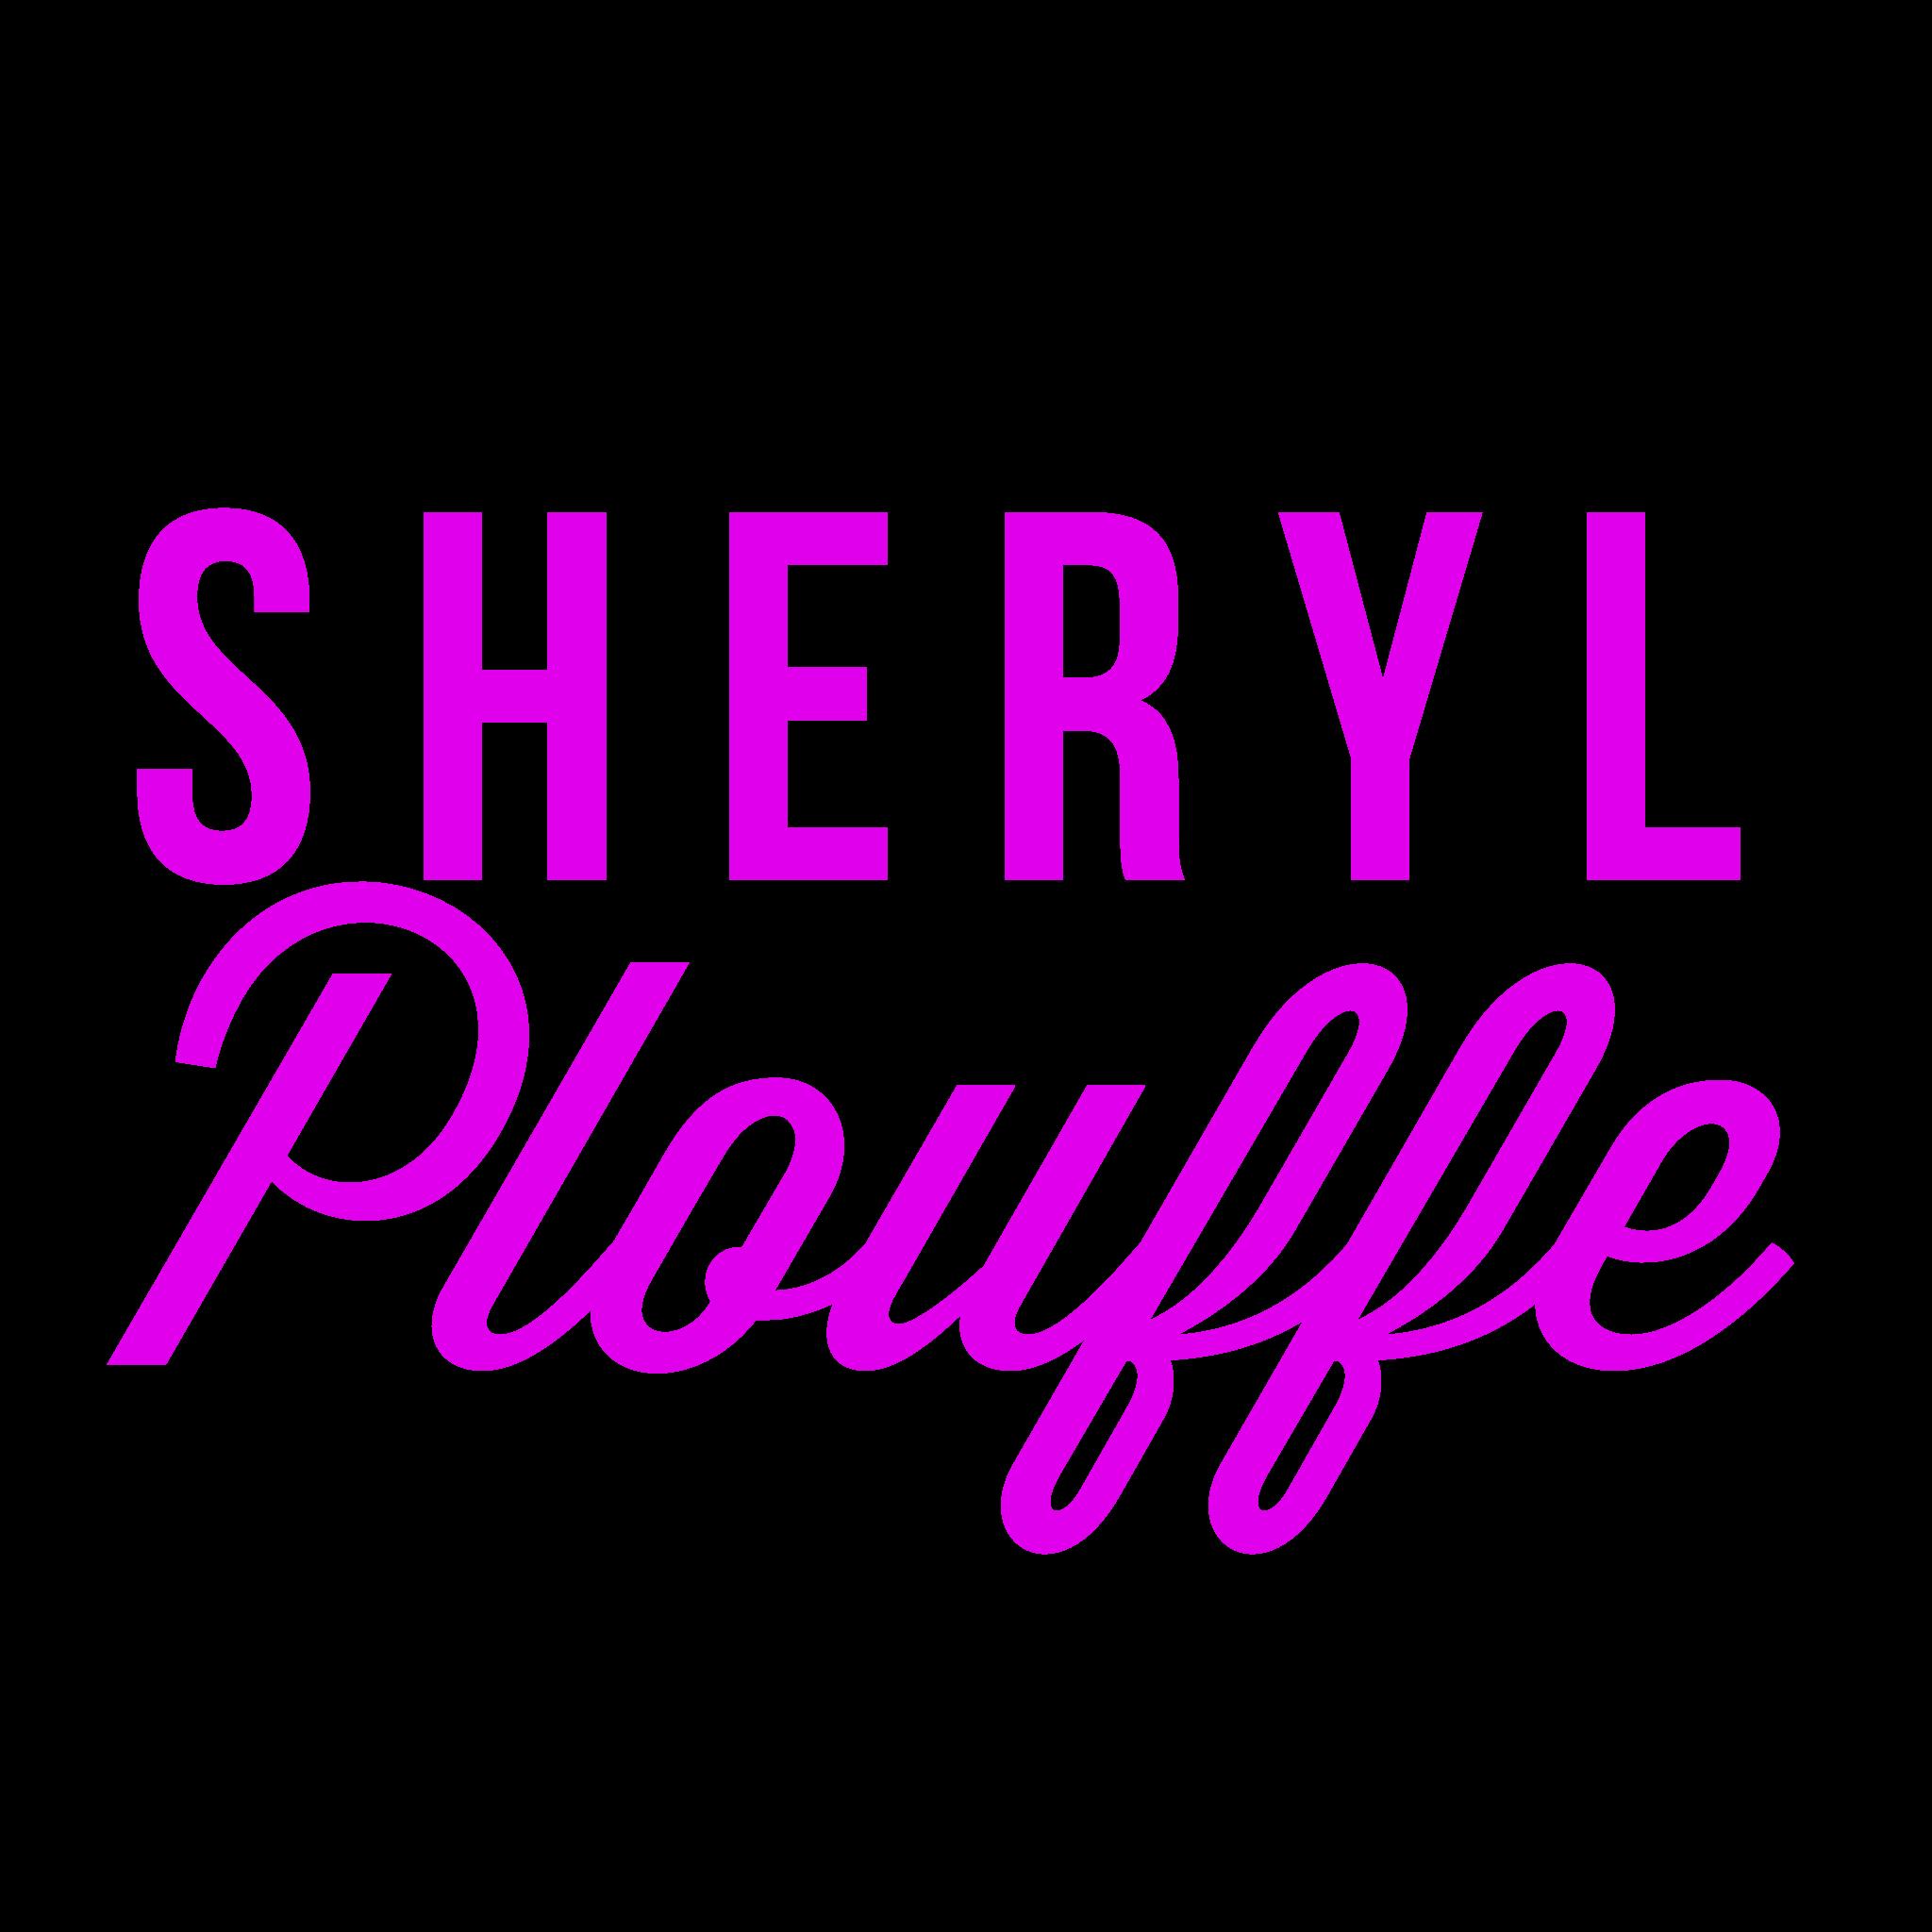 Sheryl Plouffe